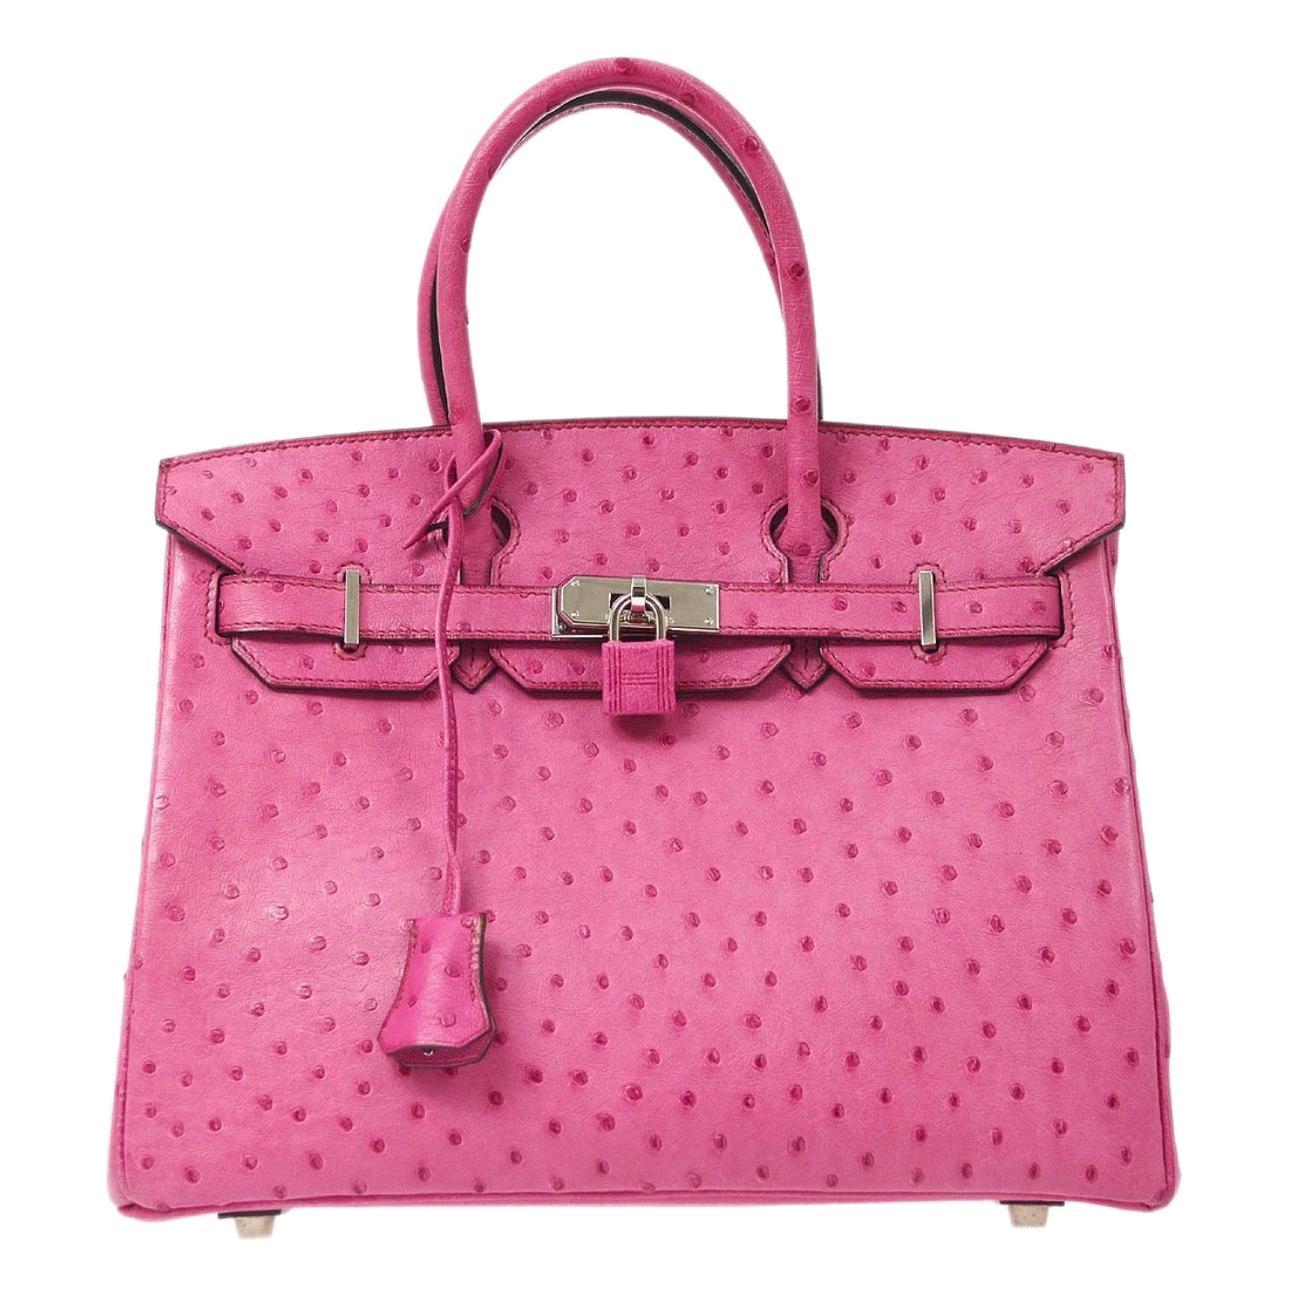 Hermes Birkin 30 Pink Ostrich Leather Exotic Silver Top Handle Satchel Tote Bag